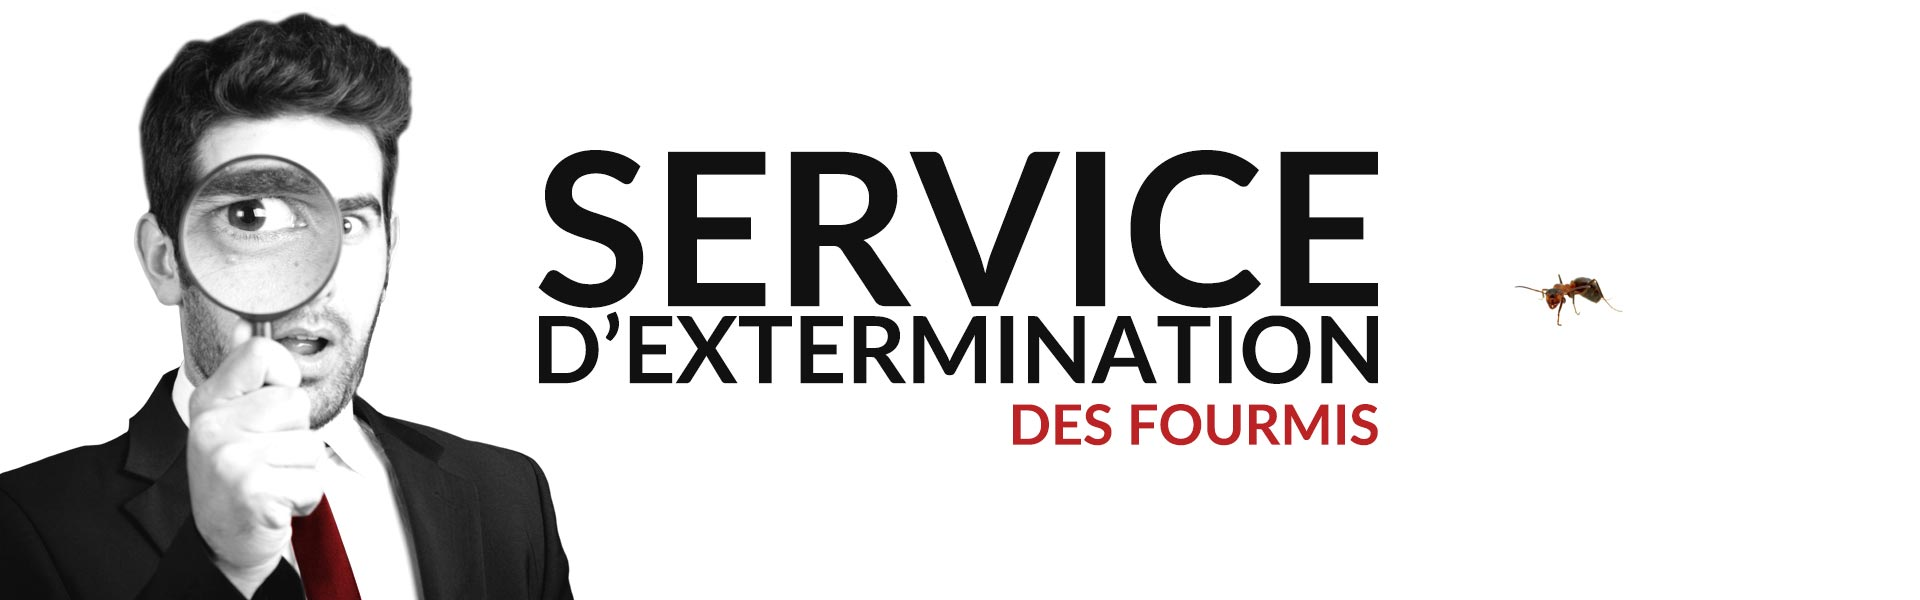 Groupe AZ extermination exterminateur fourmis